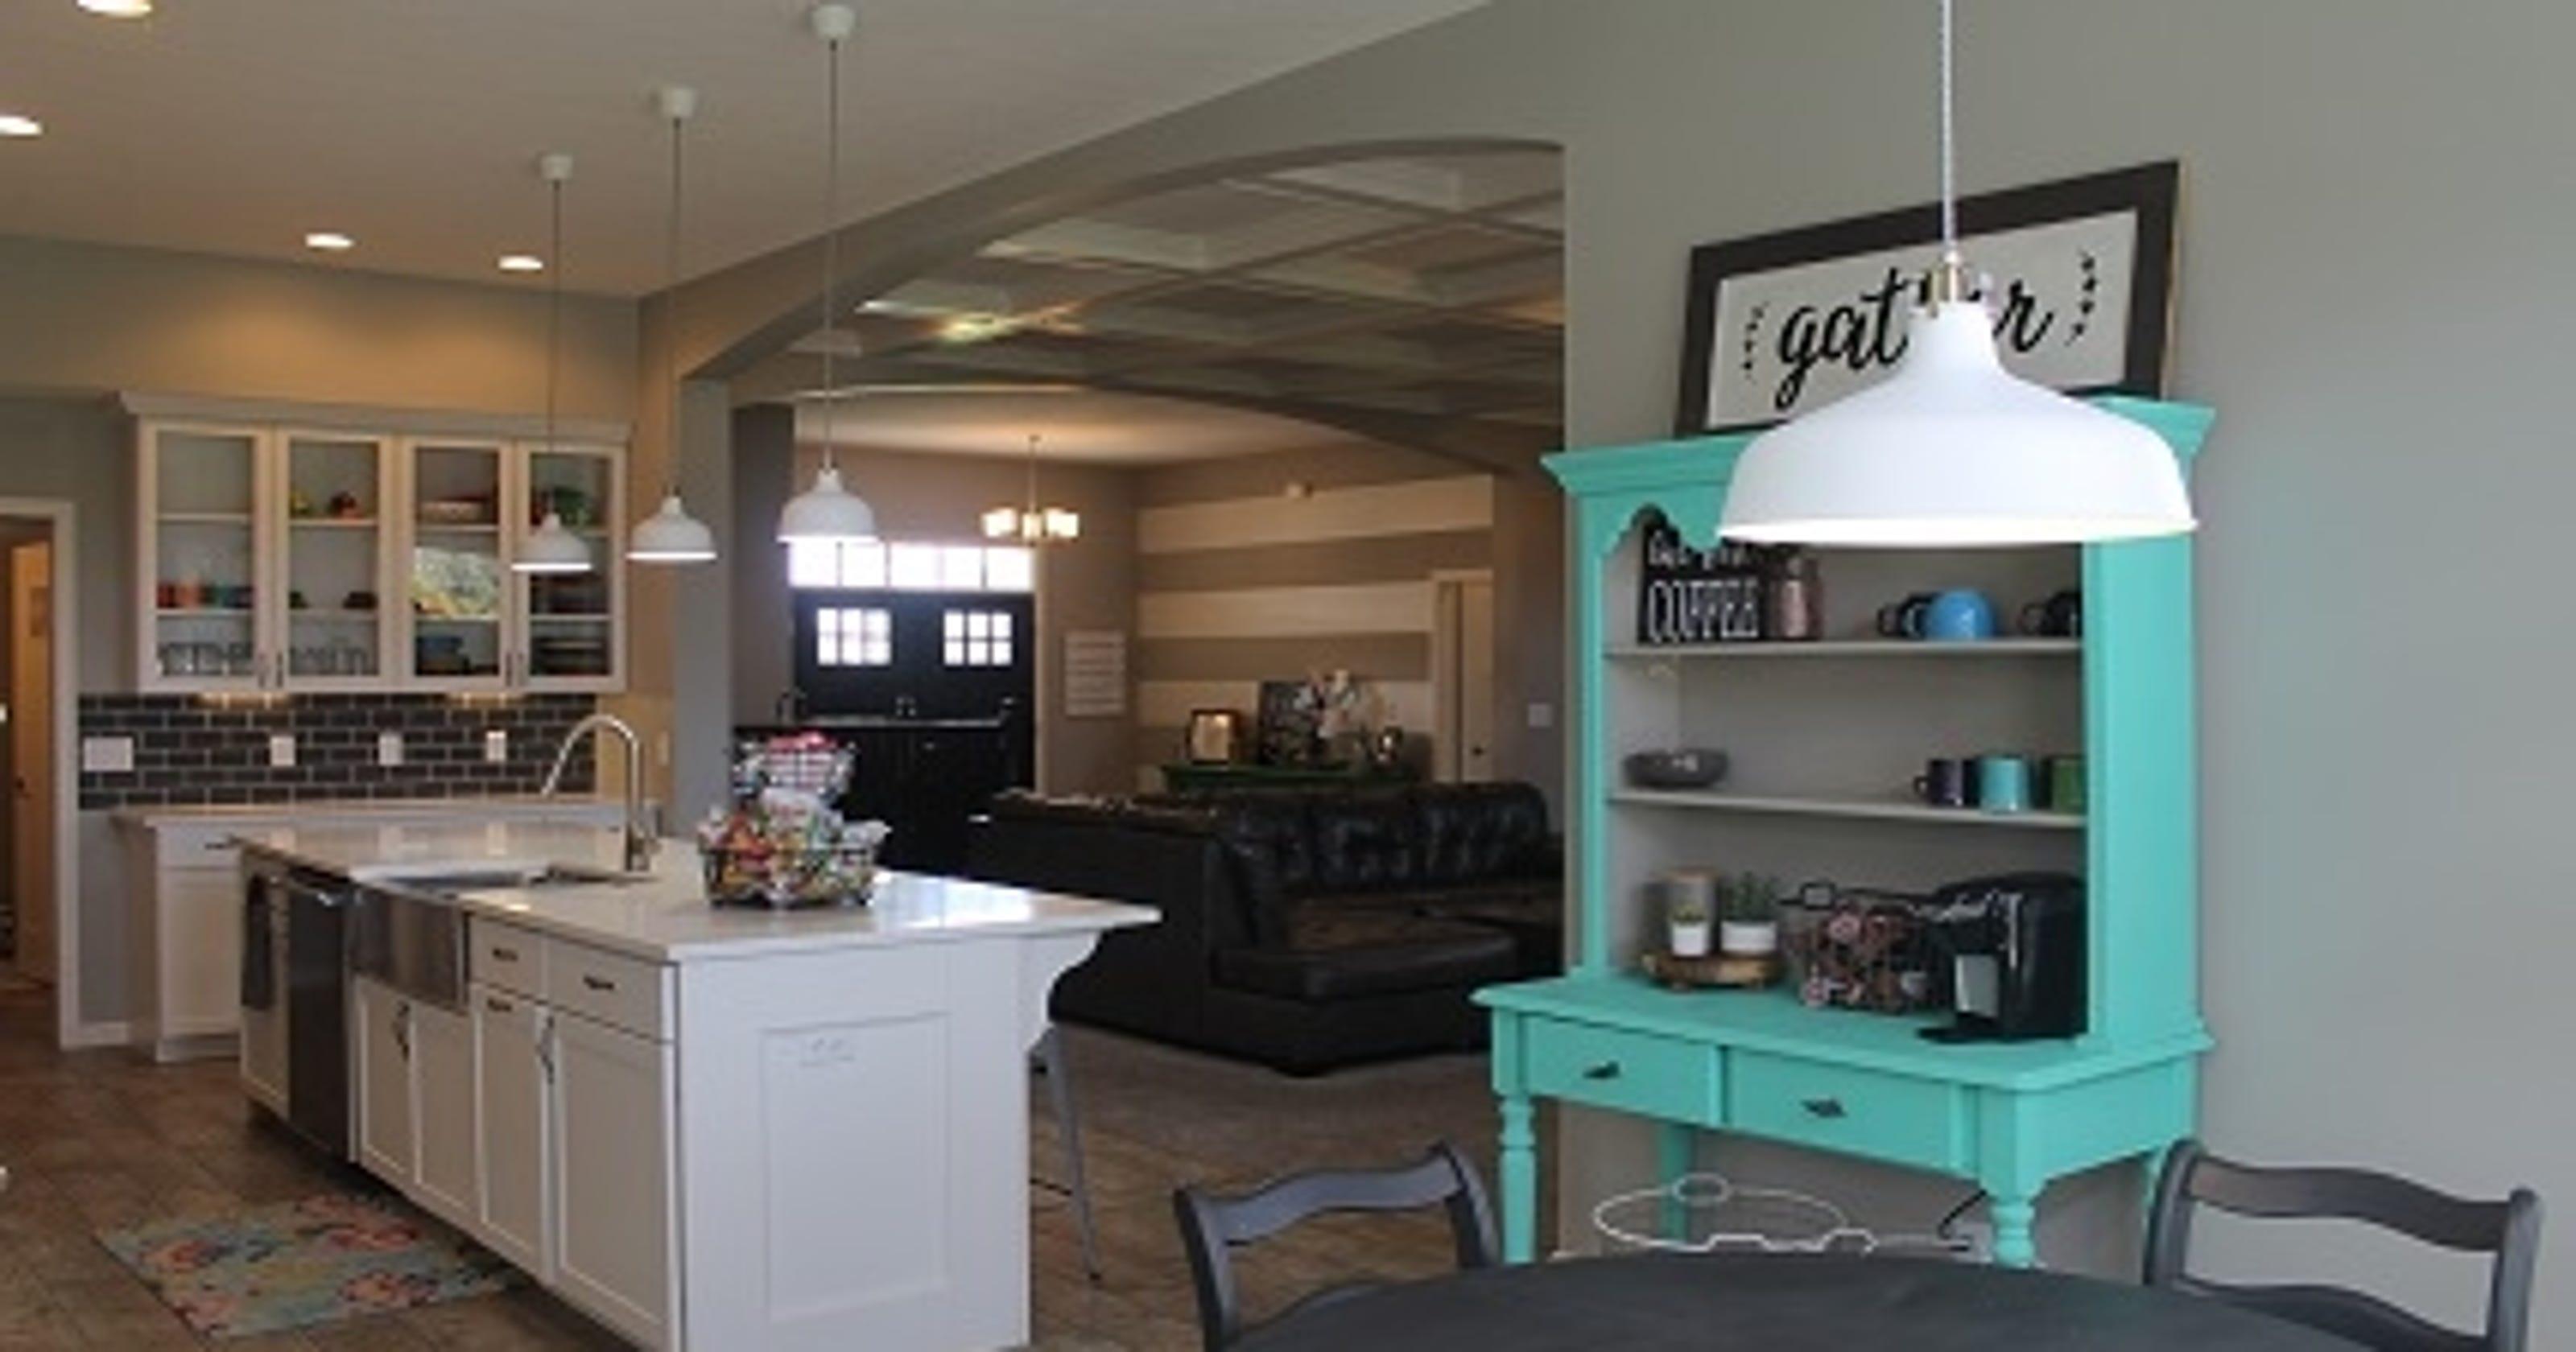 Take A Virtual Tour: $500K Lafayette Home With Modern Chic